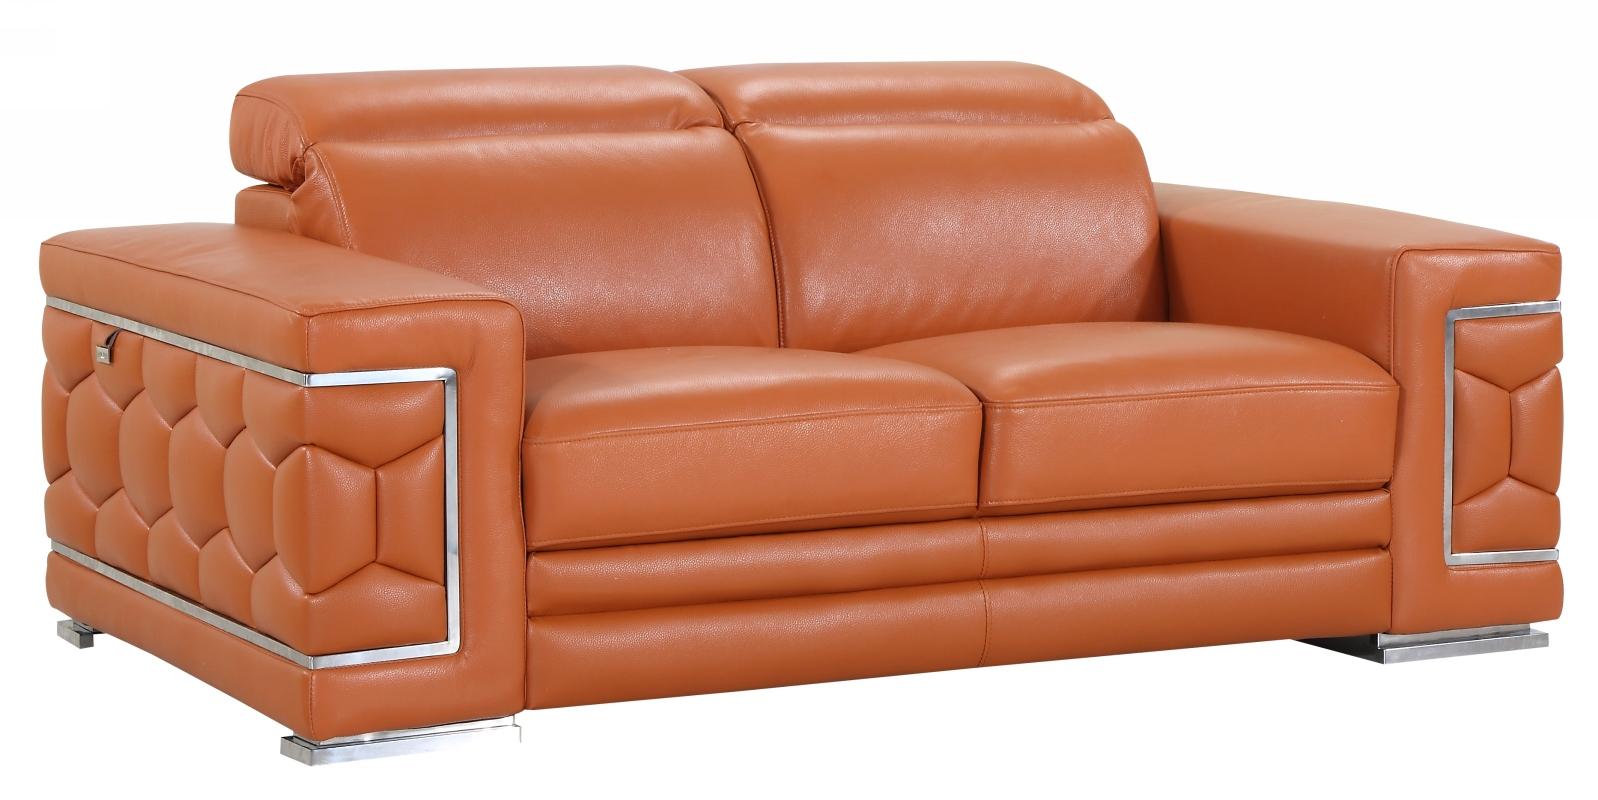 "71"" Sturdy Camel Leather Loveseat"